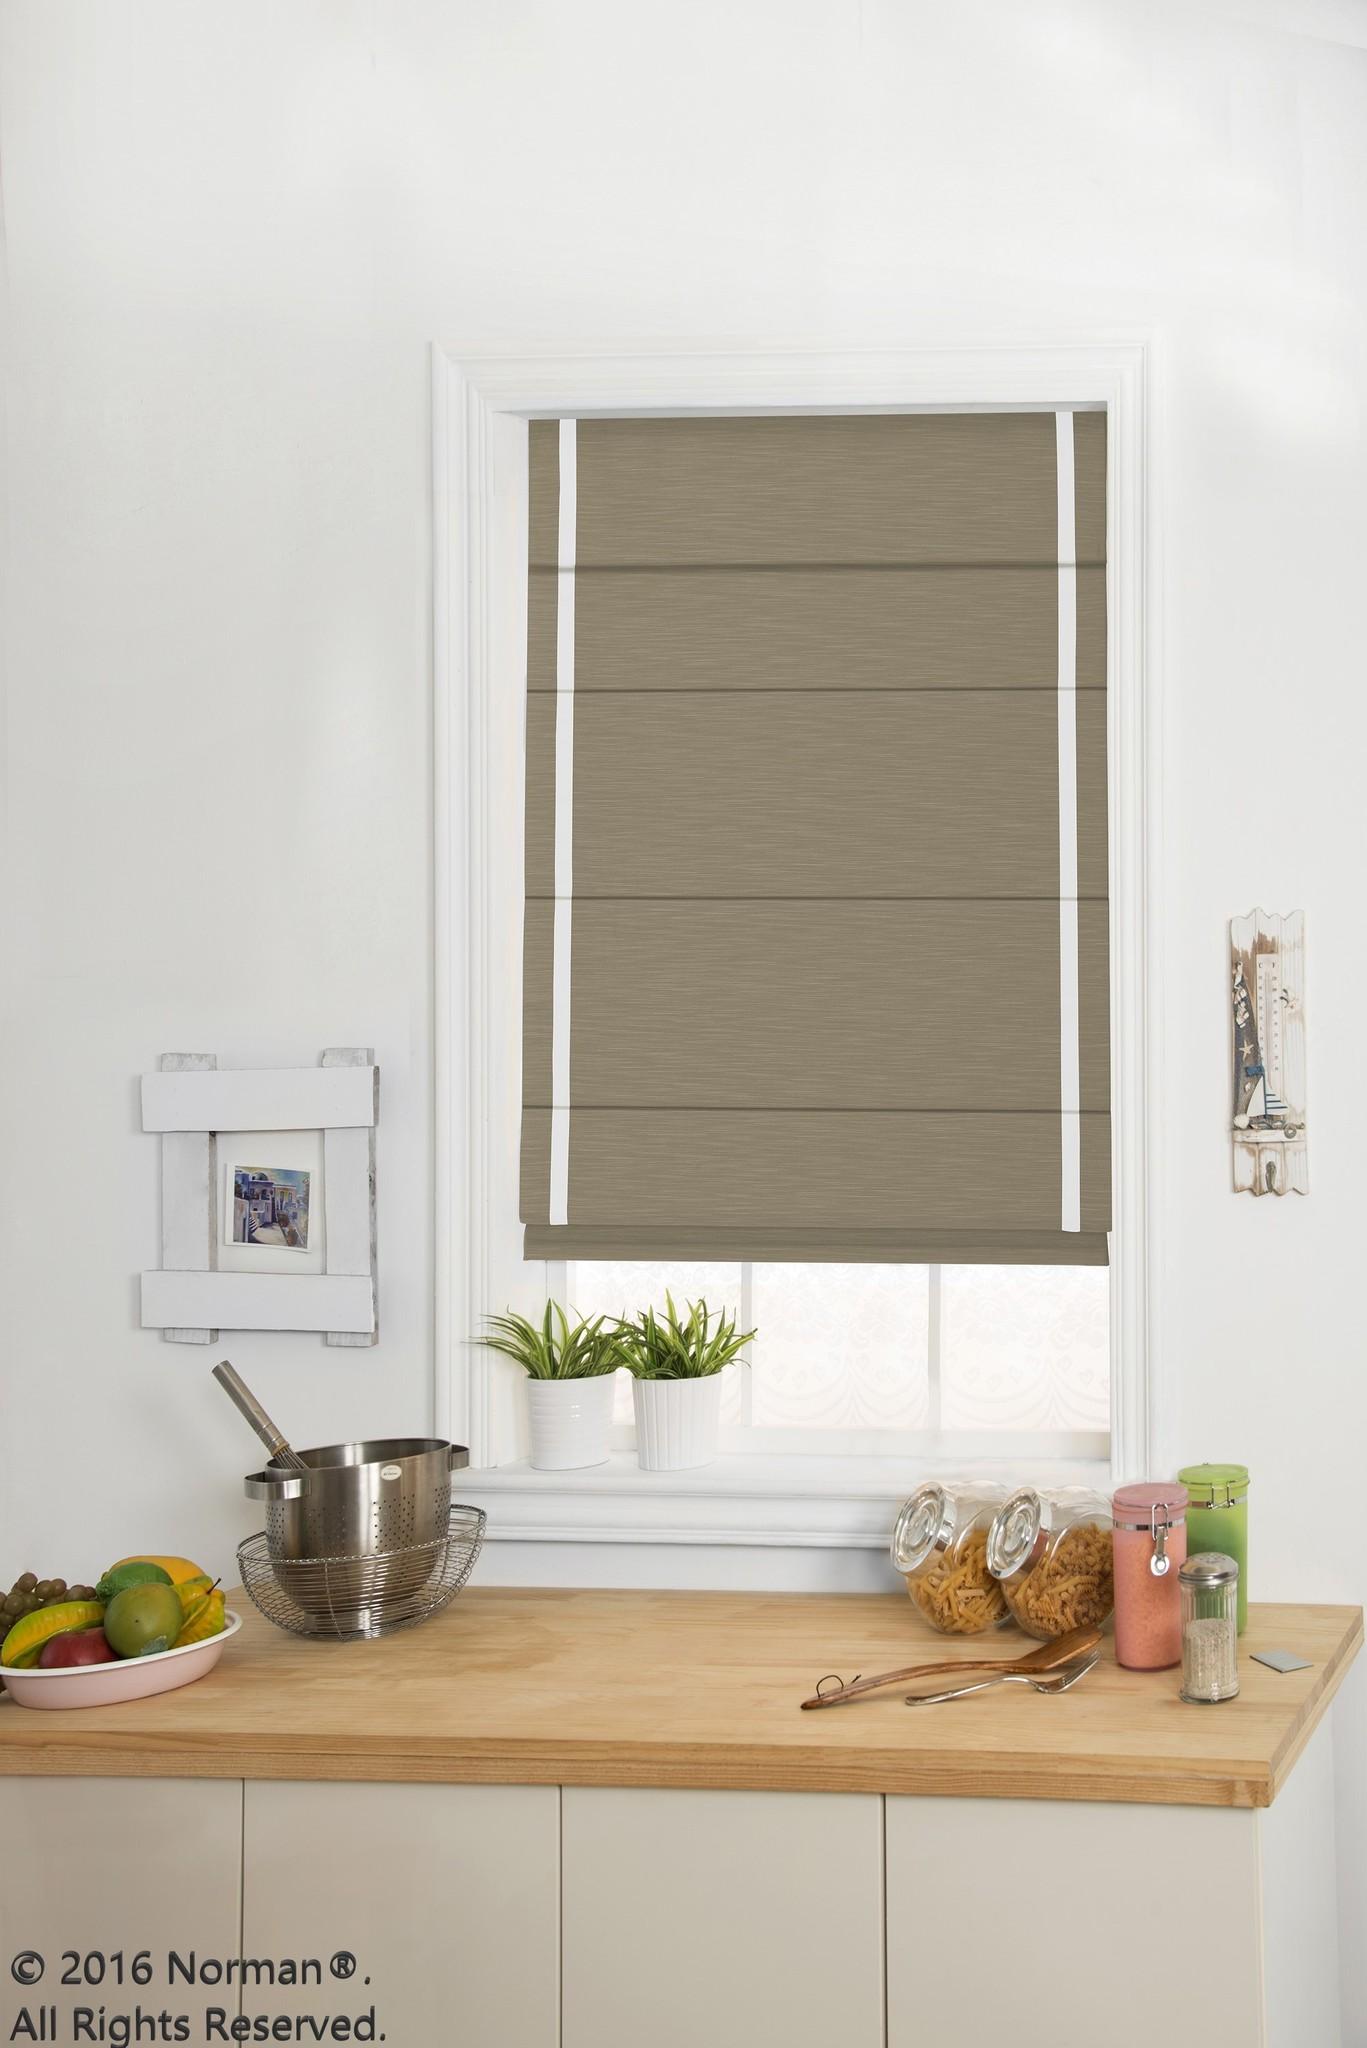 Norman Window Shades Centerpiece™ Roman Shades